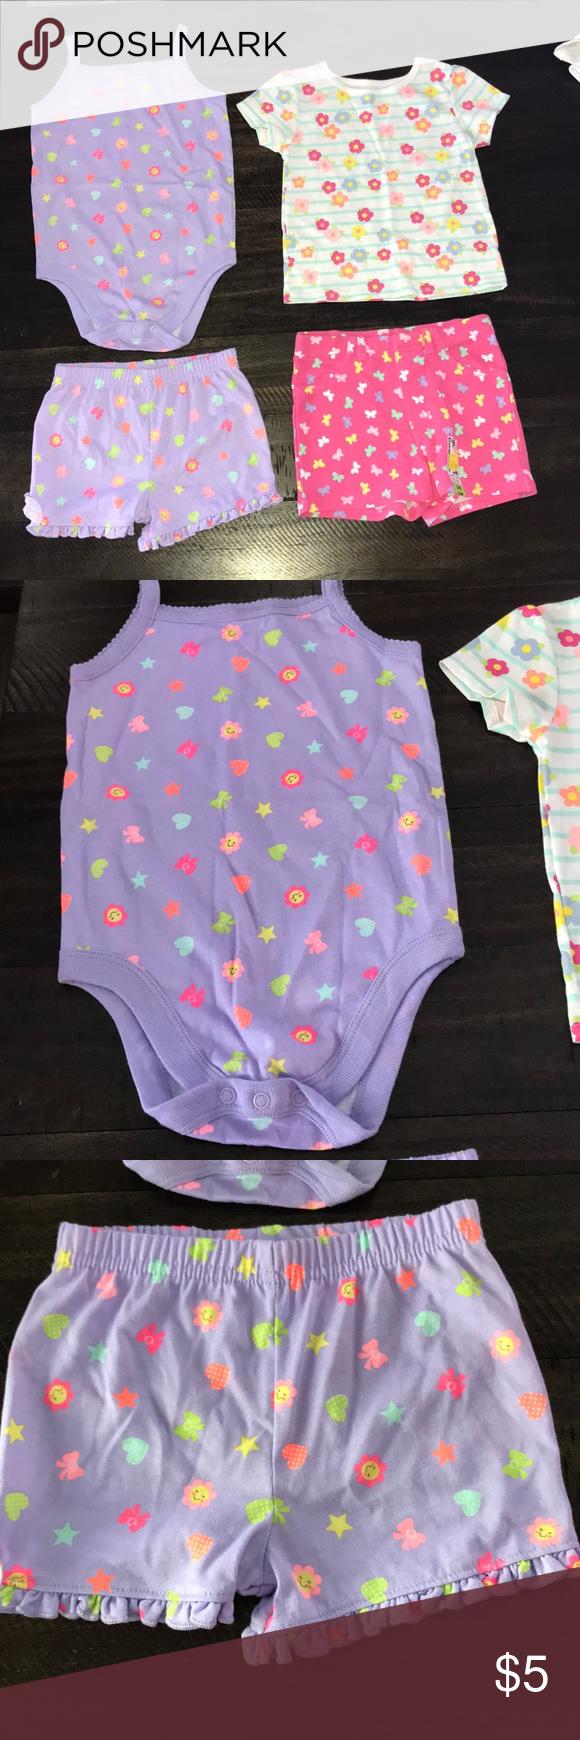 e6ed3154198 24 month lot Adorable lot of baby girls clothes ❣️Garanimals brand  ❣️Onesie